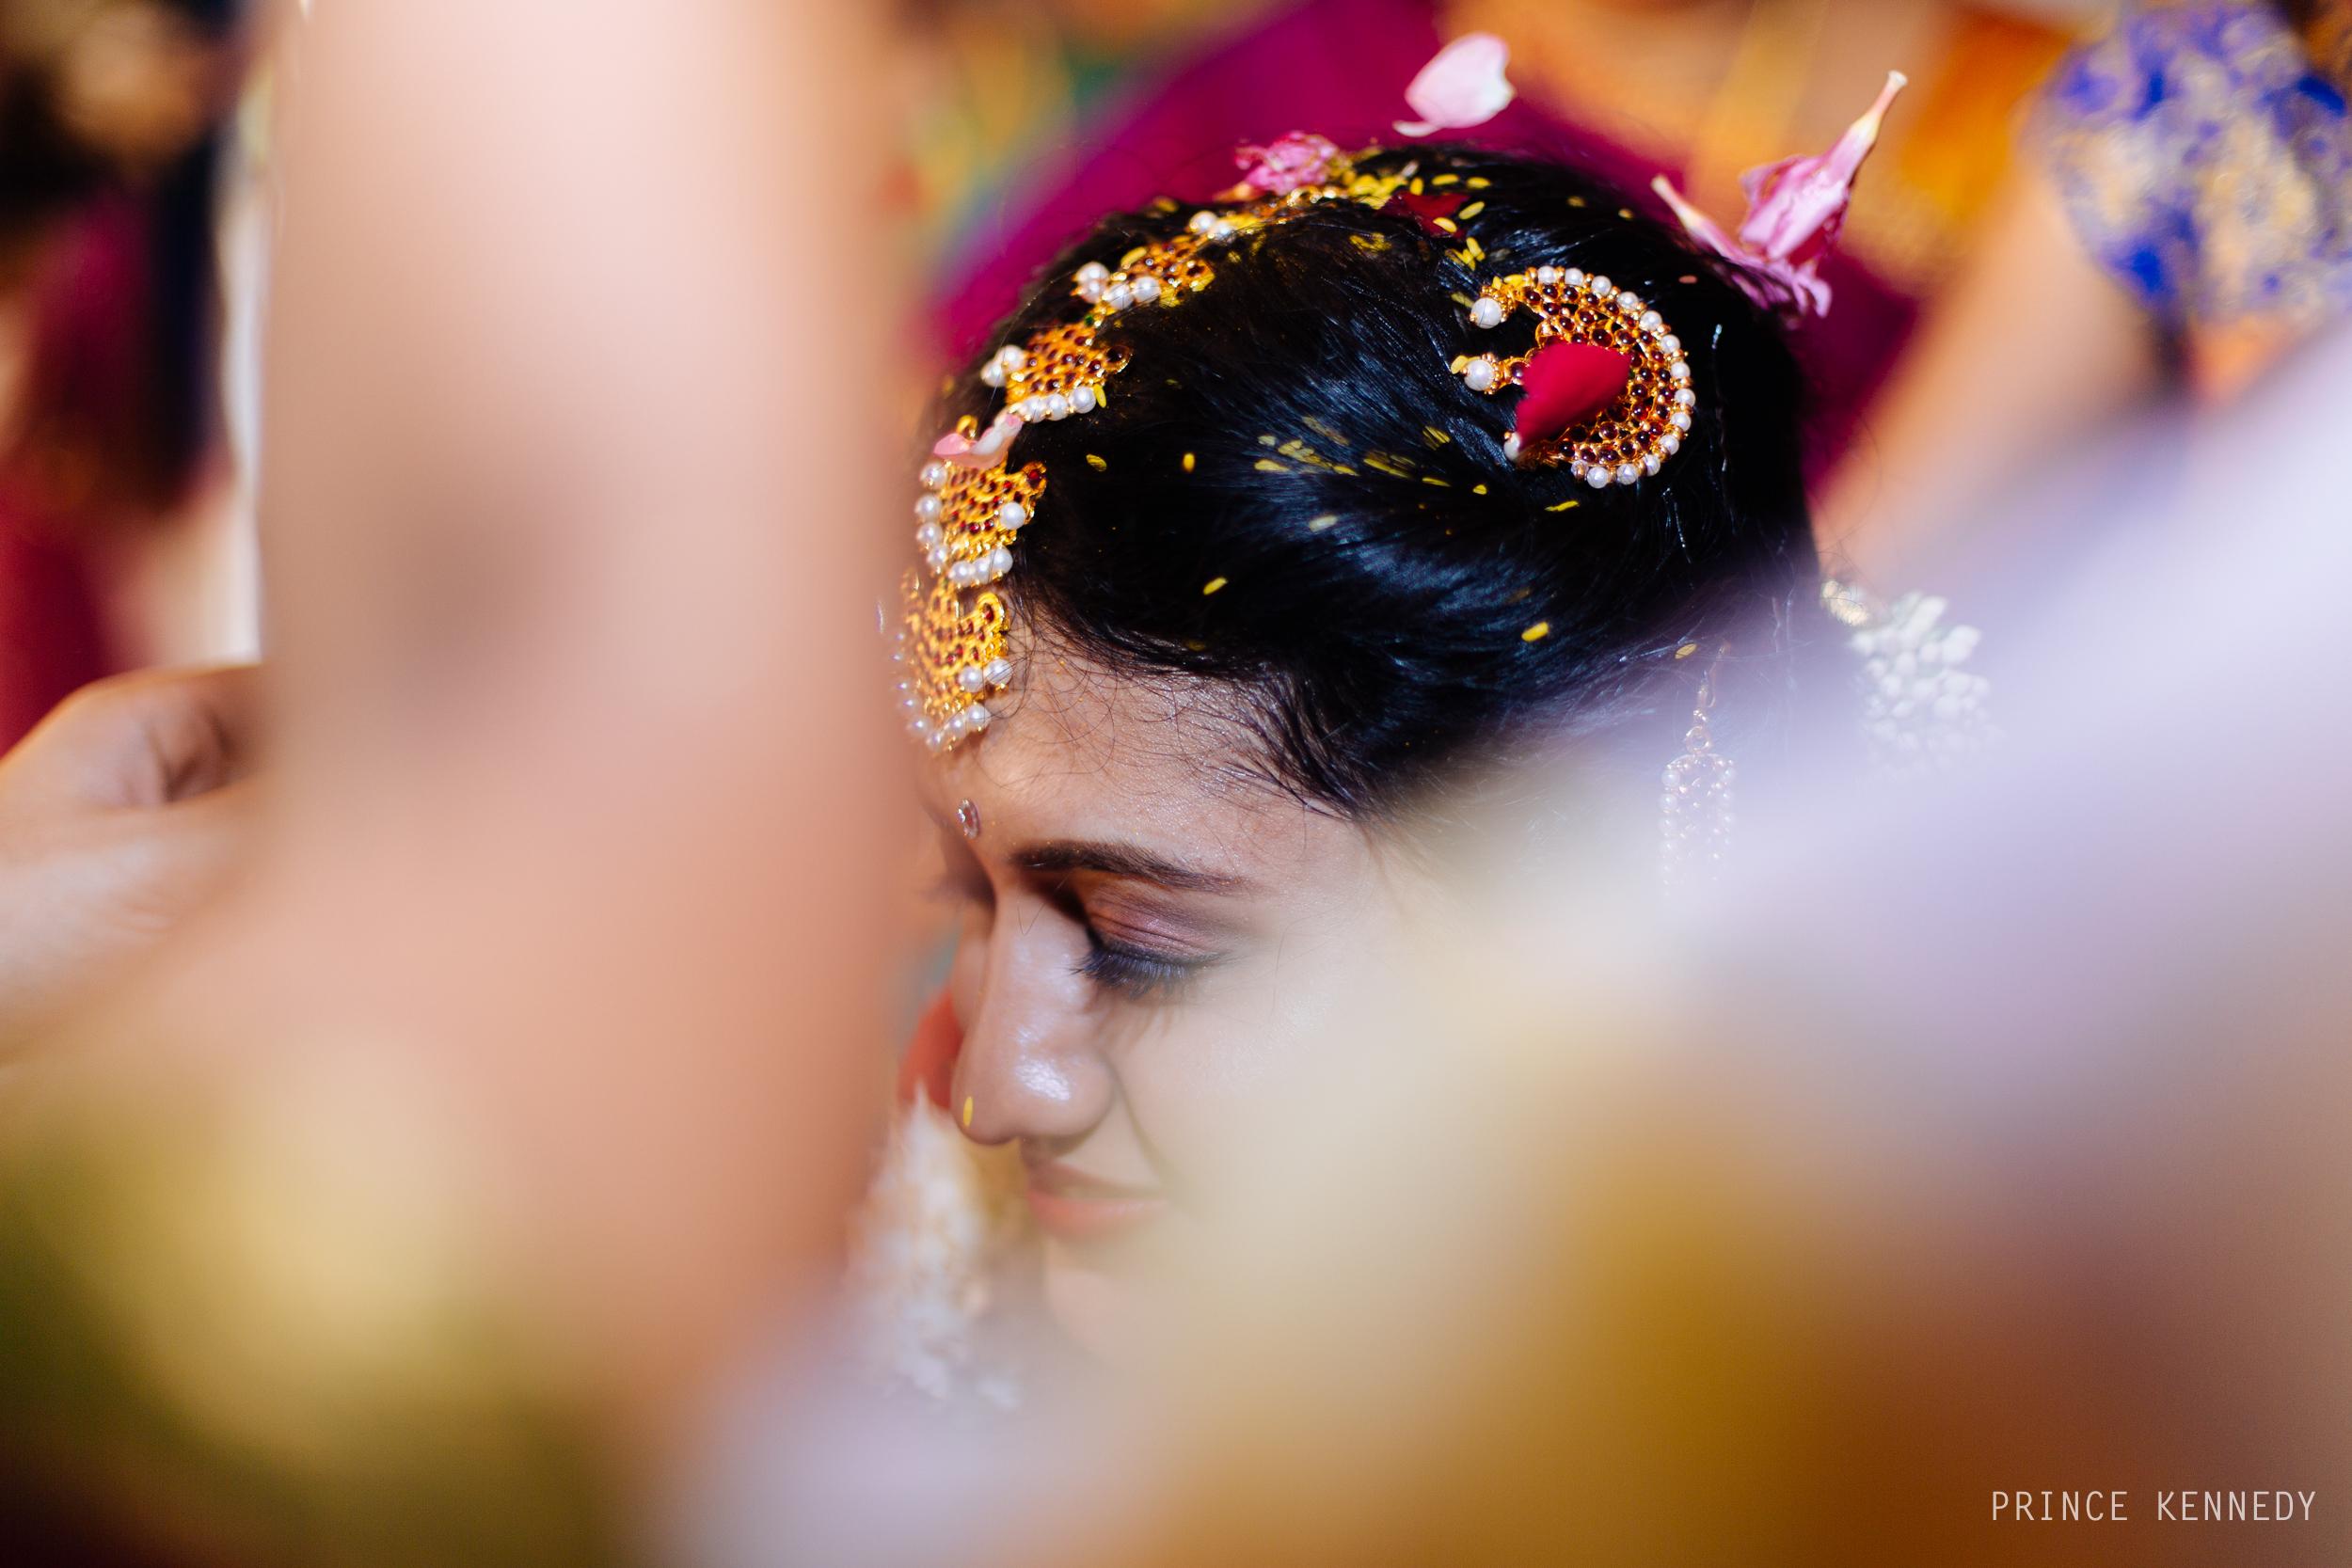 Athmajja-Nithesh-Engagement-Couple-Portrait-Portraiture-Wedding-Couple-Portrait-Chennai-Photographer-Candid-Photography-Destination-Best-Prince-Kennedy-Photography-290.jpg